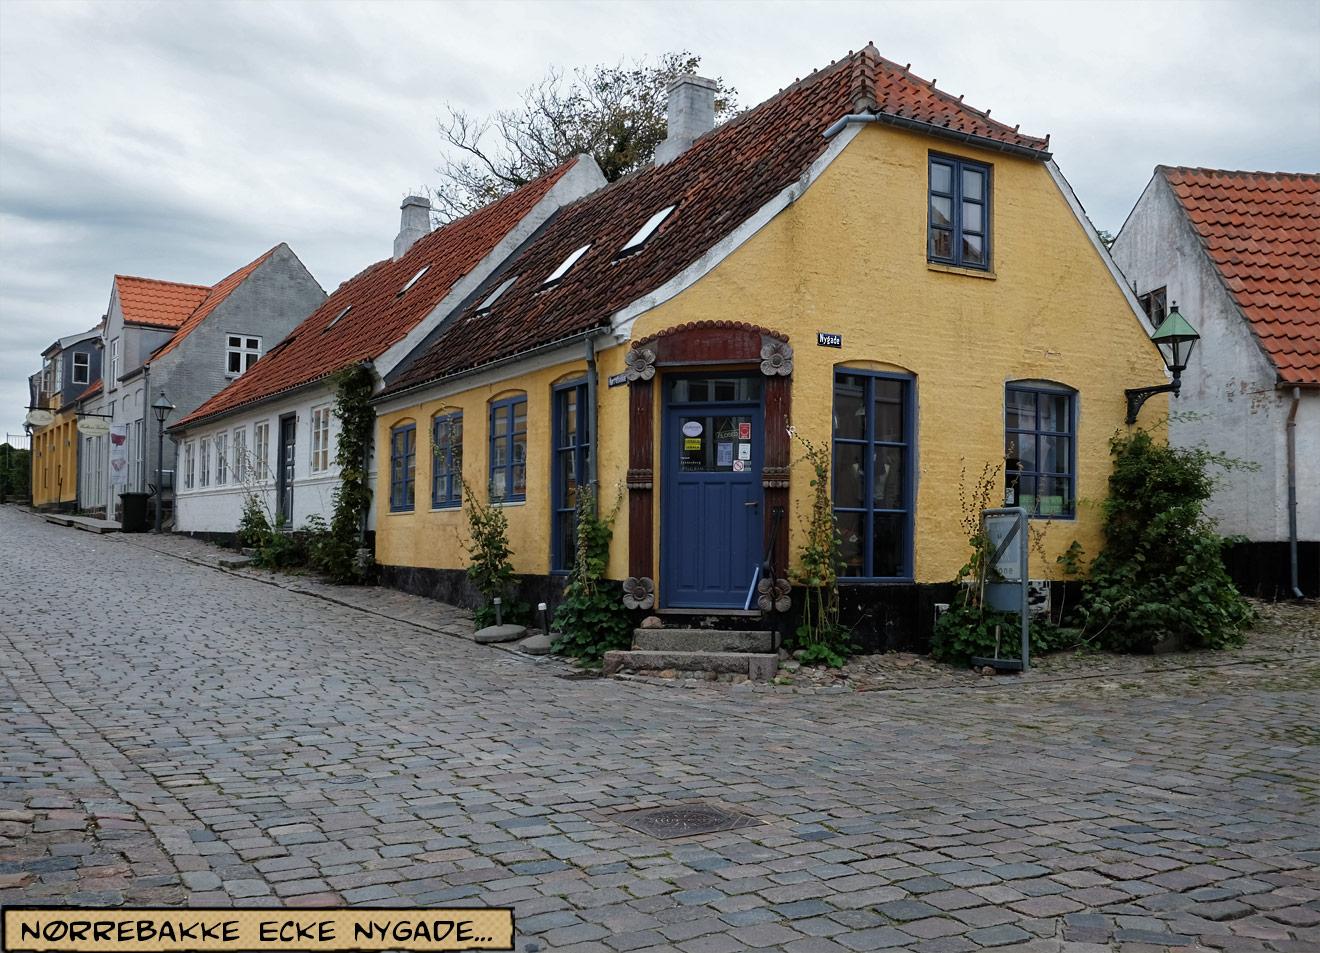 Ebeltoft Nørrebakke Nygade